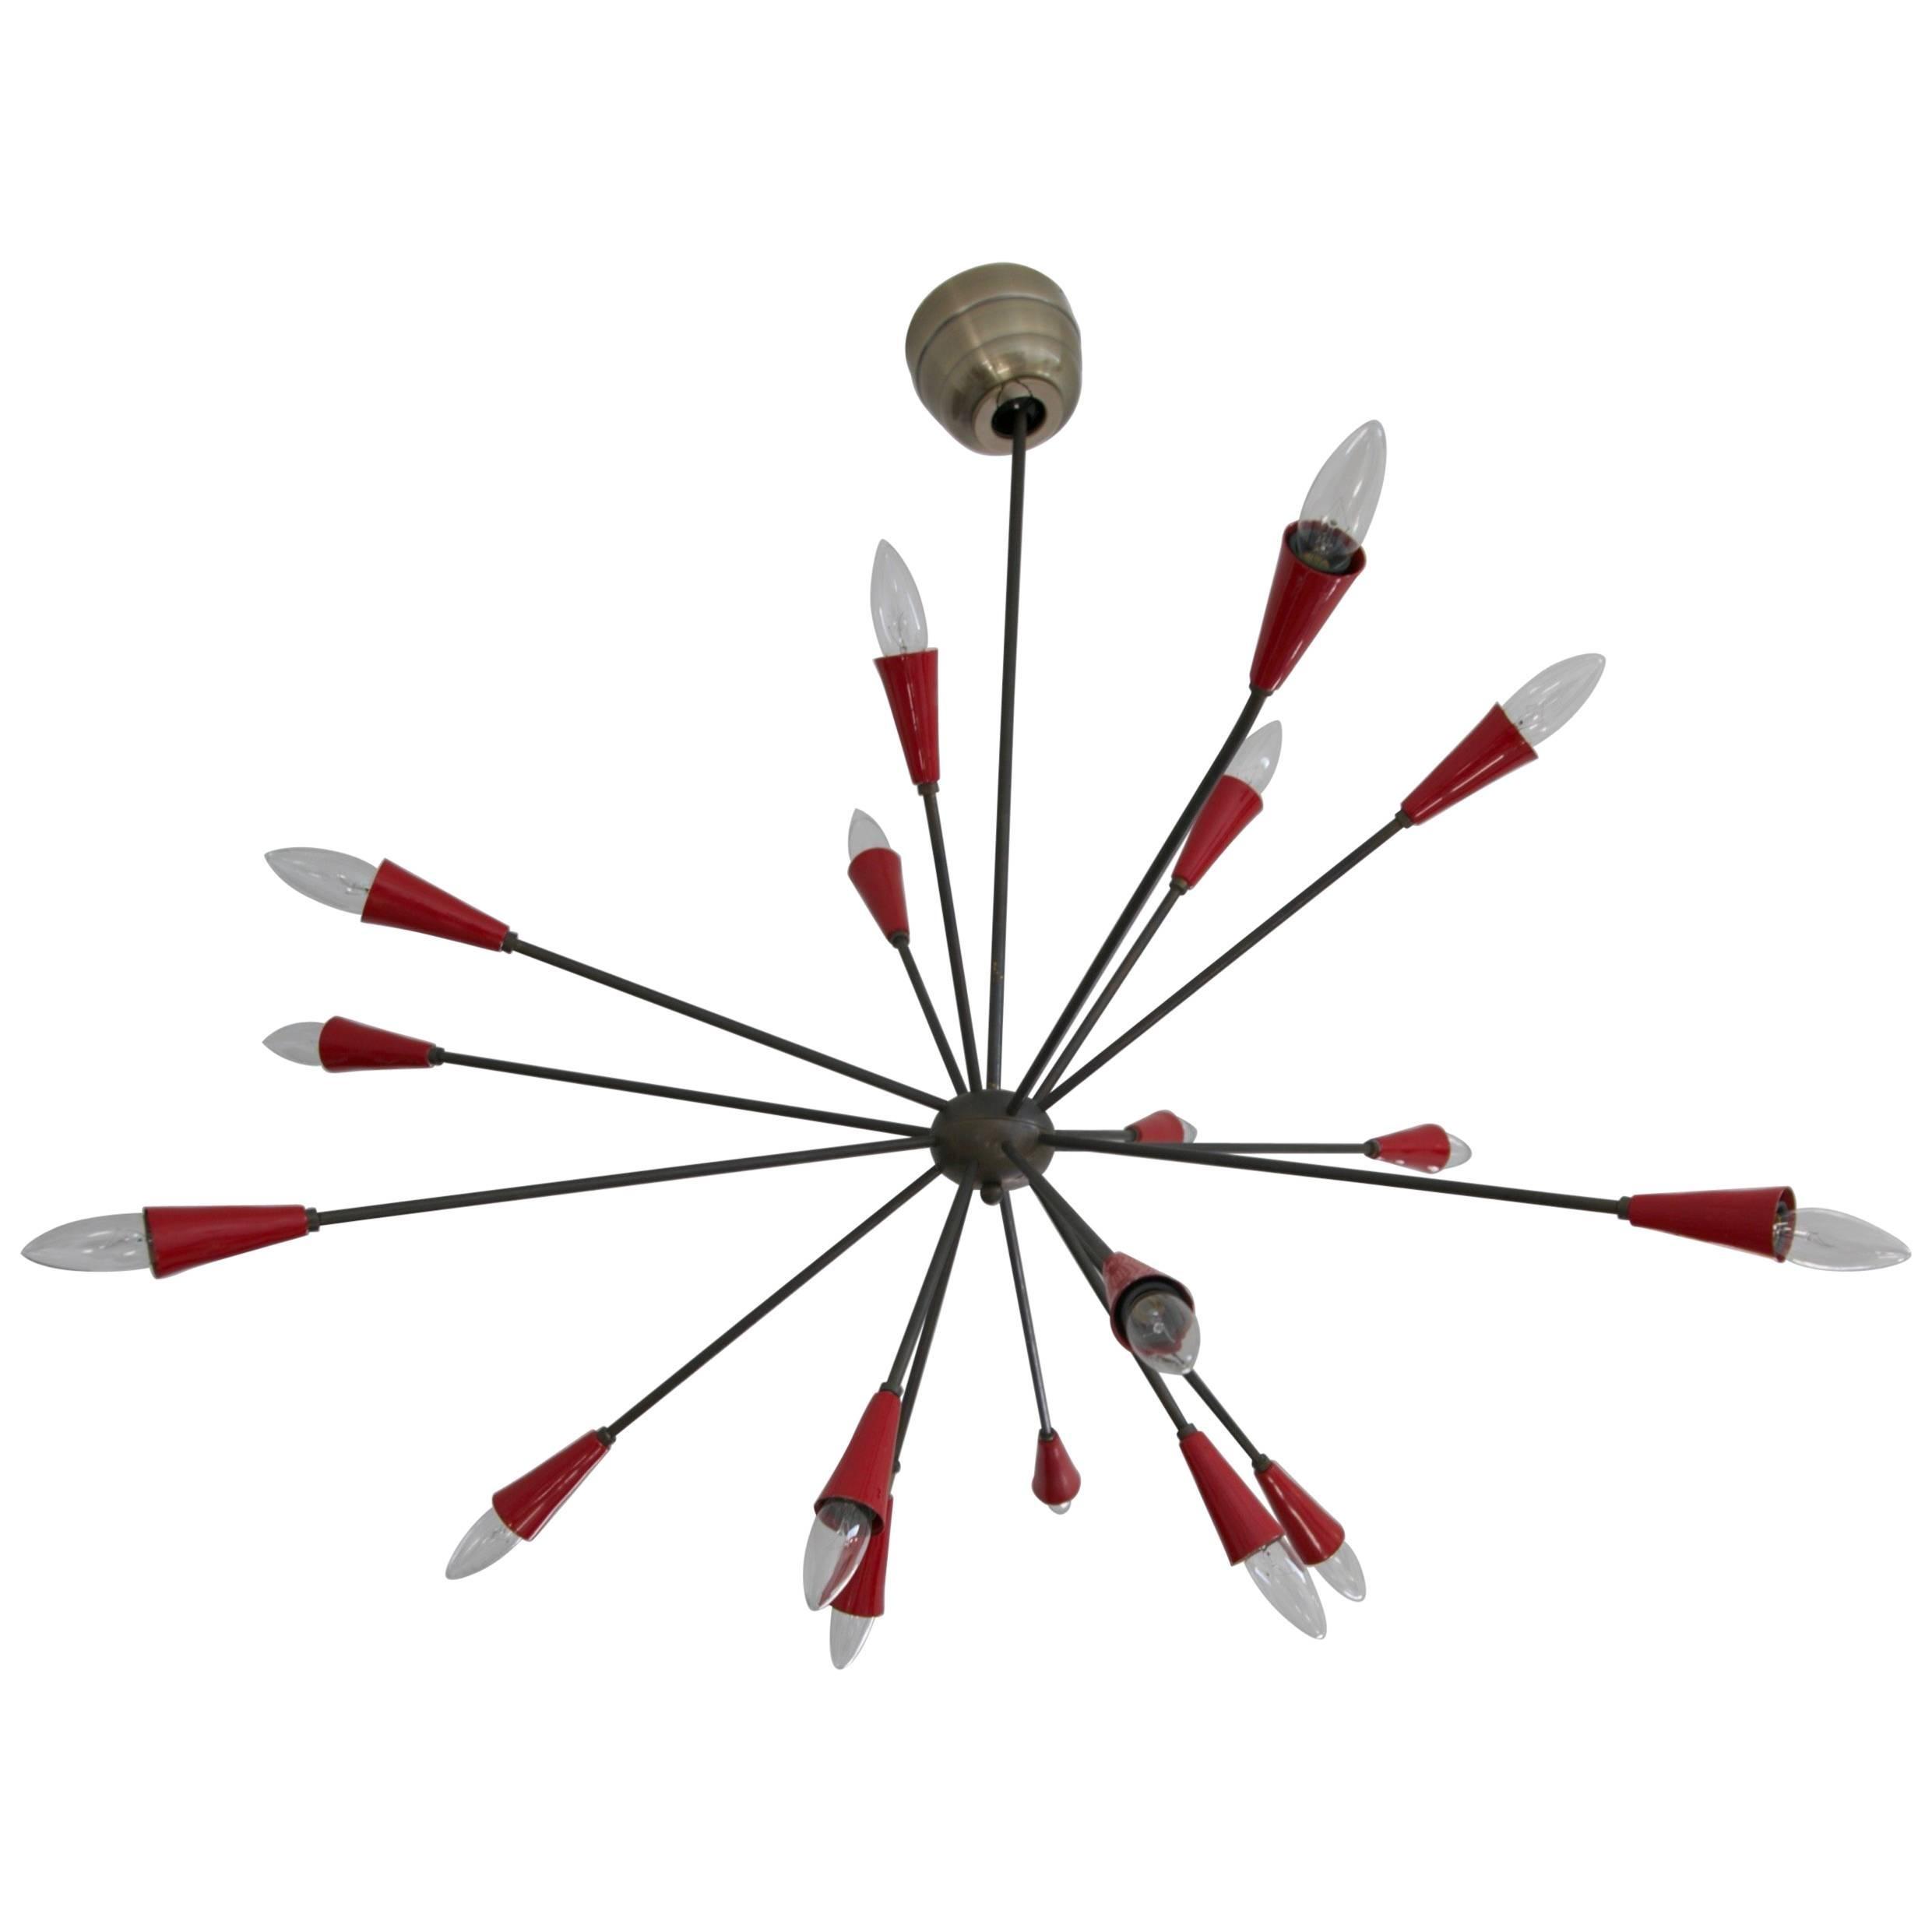 Stilnovo Attributed 17-Arm Red Sputnik Chandelier, circa 1950